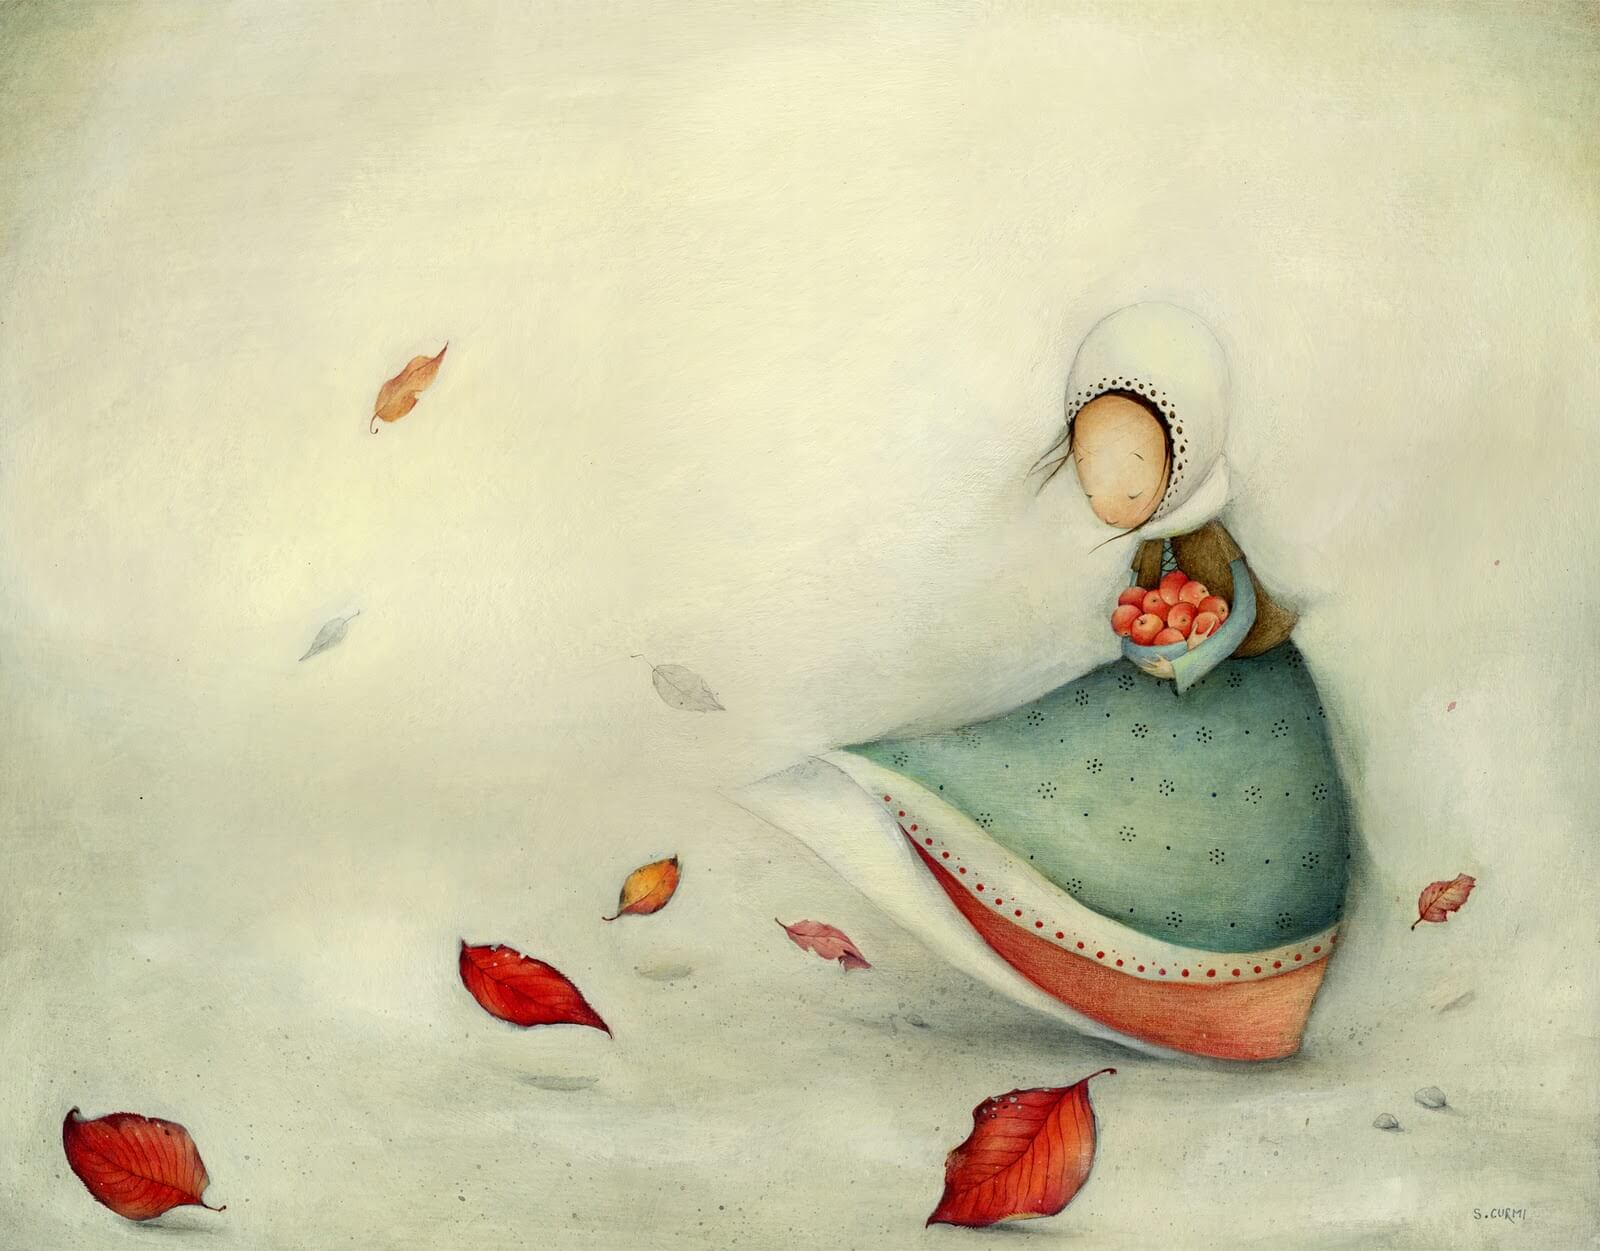 Chica con bol repleto de manzanas